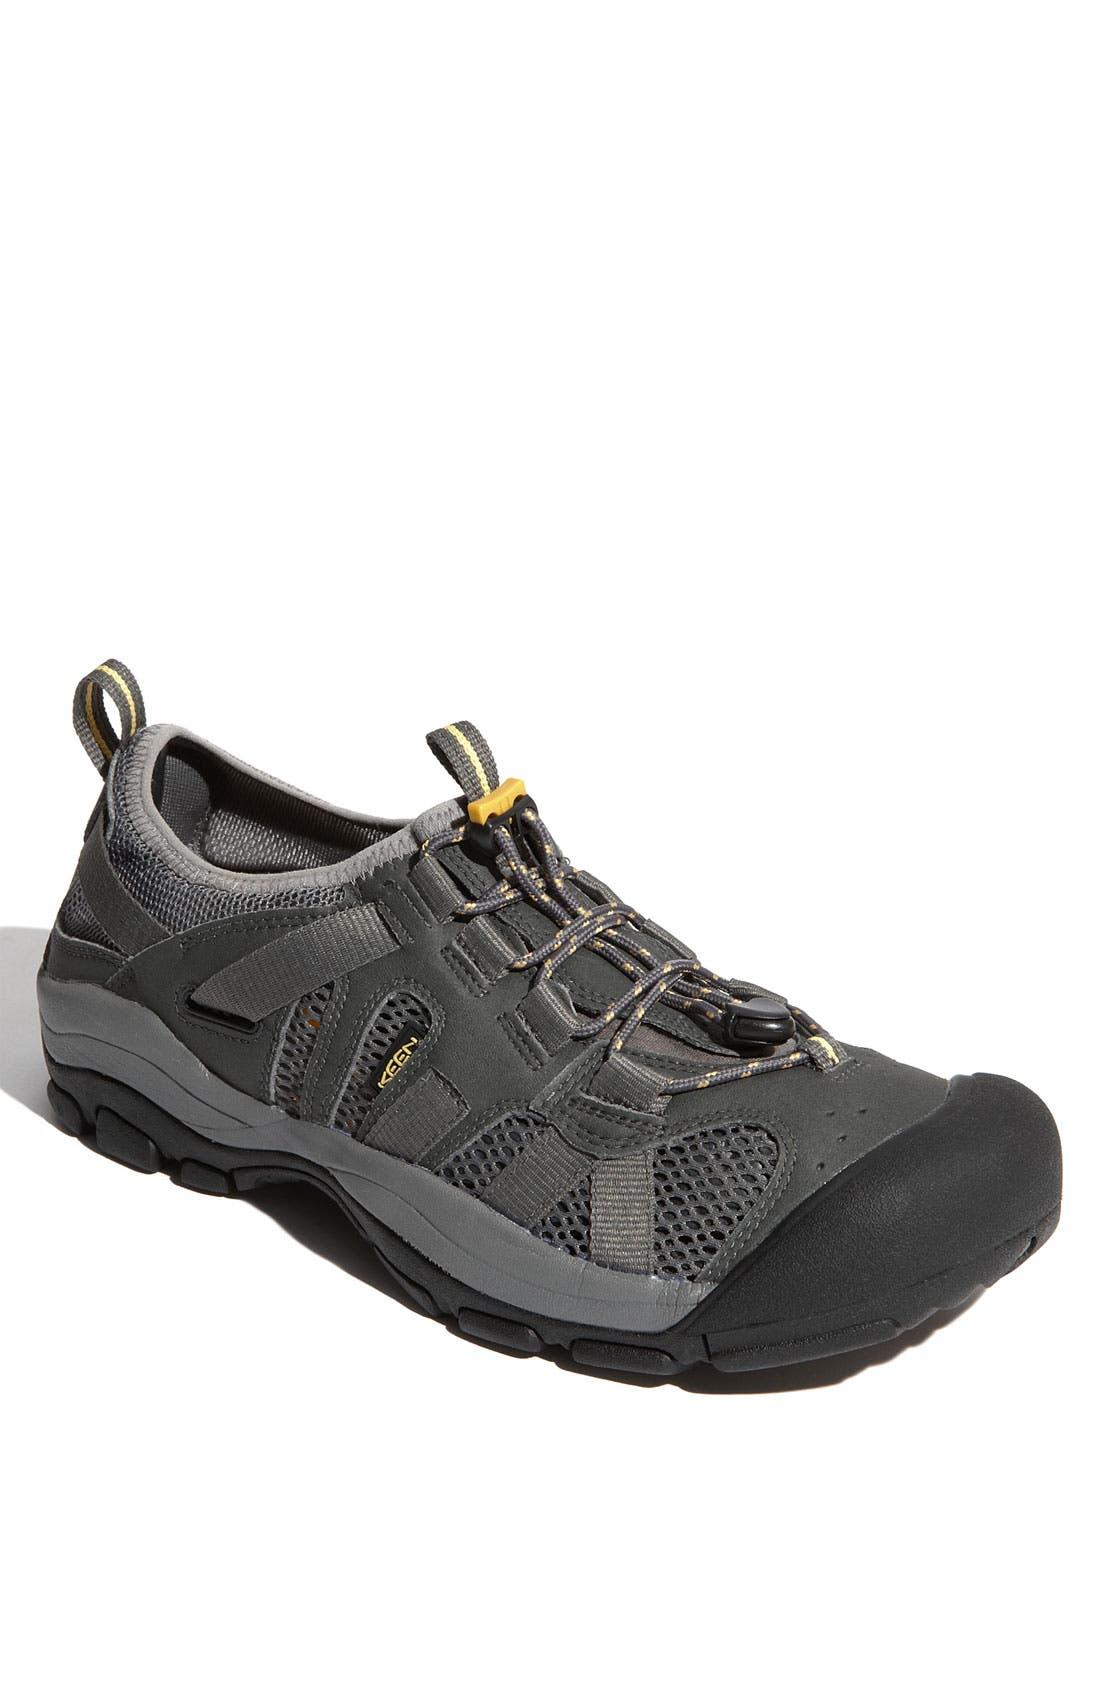 Alternate Image 1 Selected - Keen 'McKenzie' Water Shoe (Men)